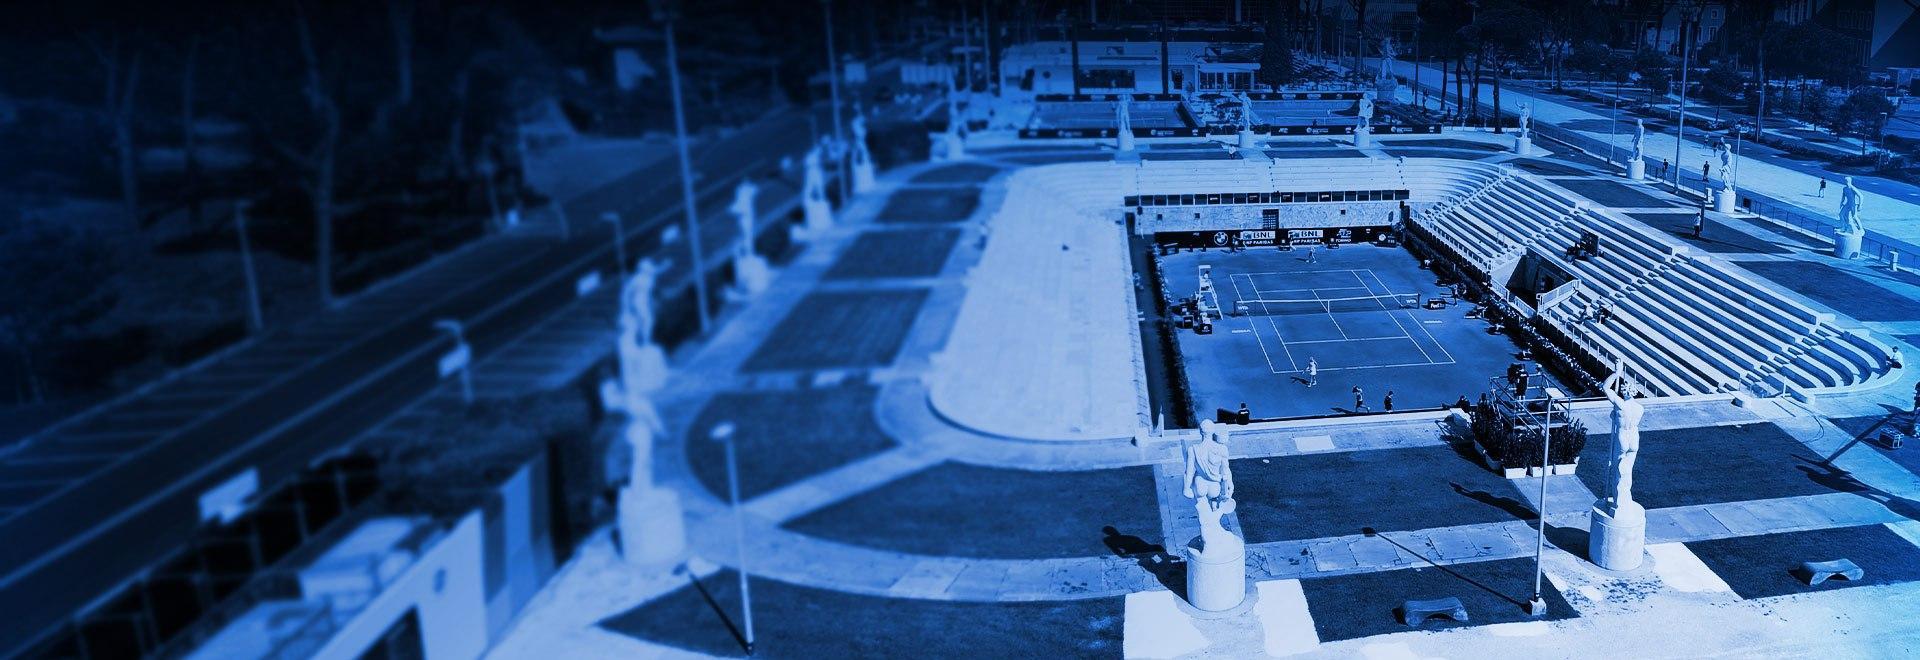 Djokovic - Sonego. 2a semifinale